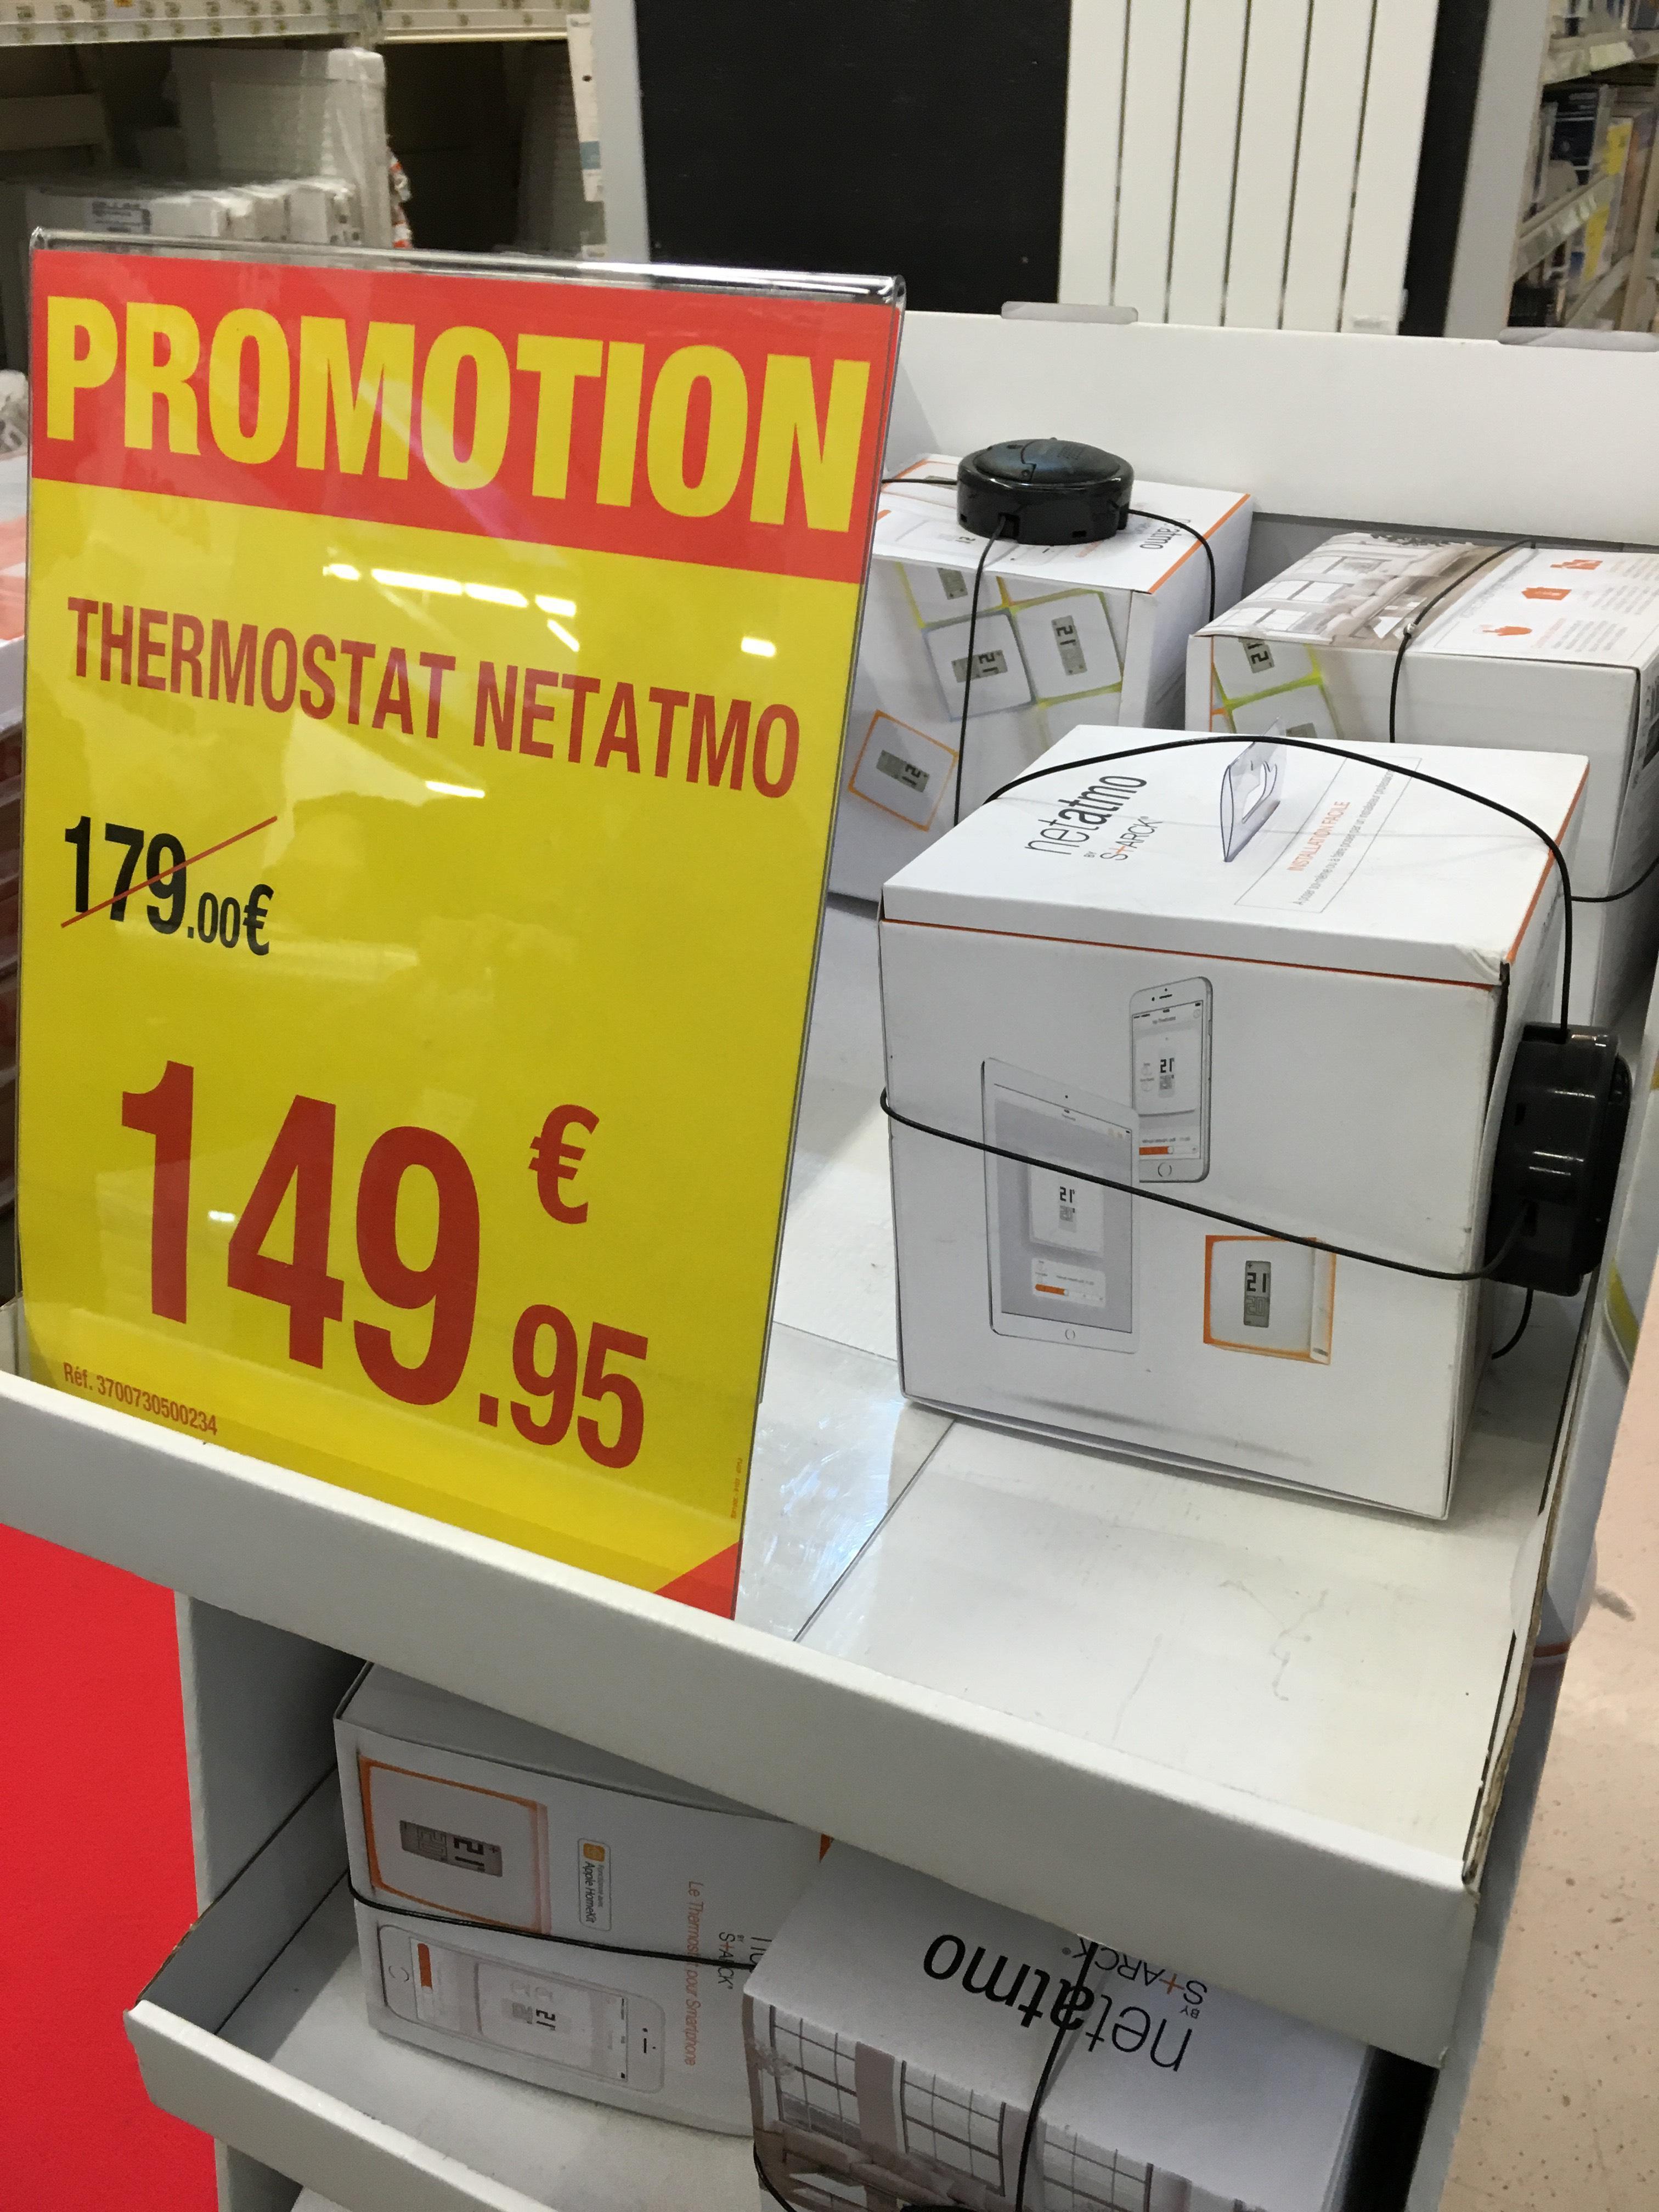 Thermostat connecté Netatmo by Starck